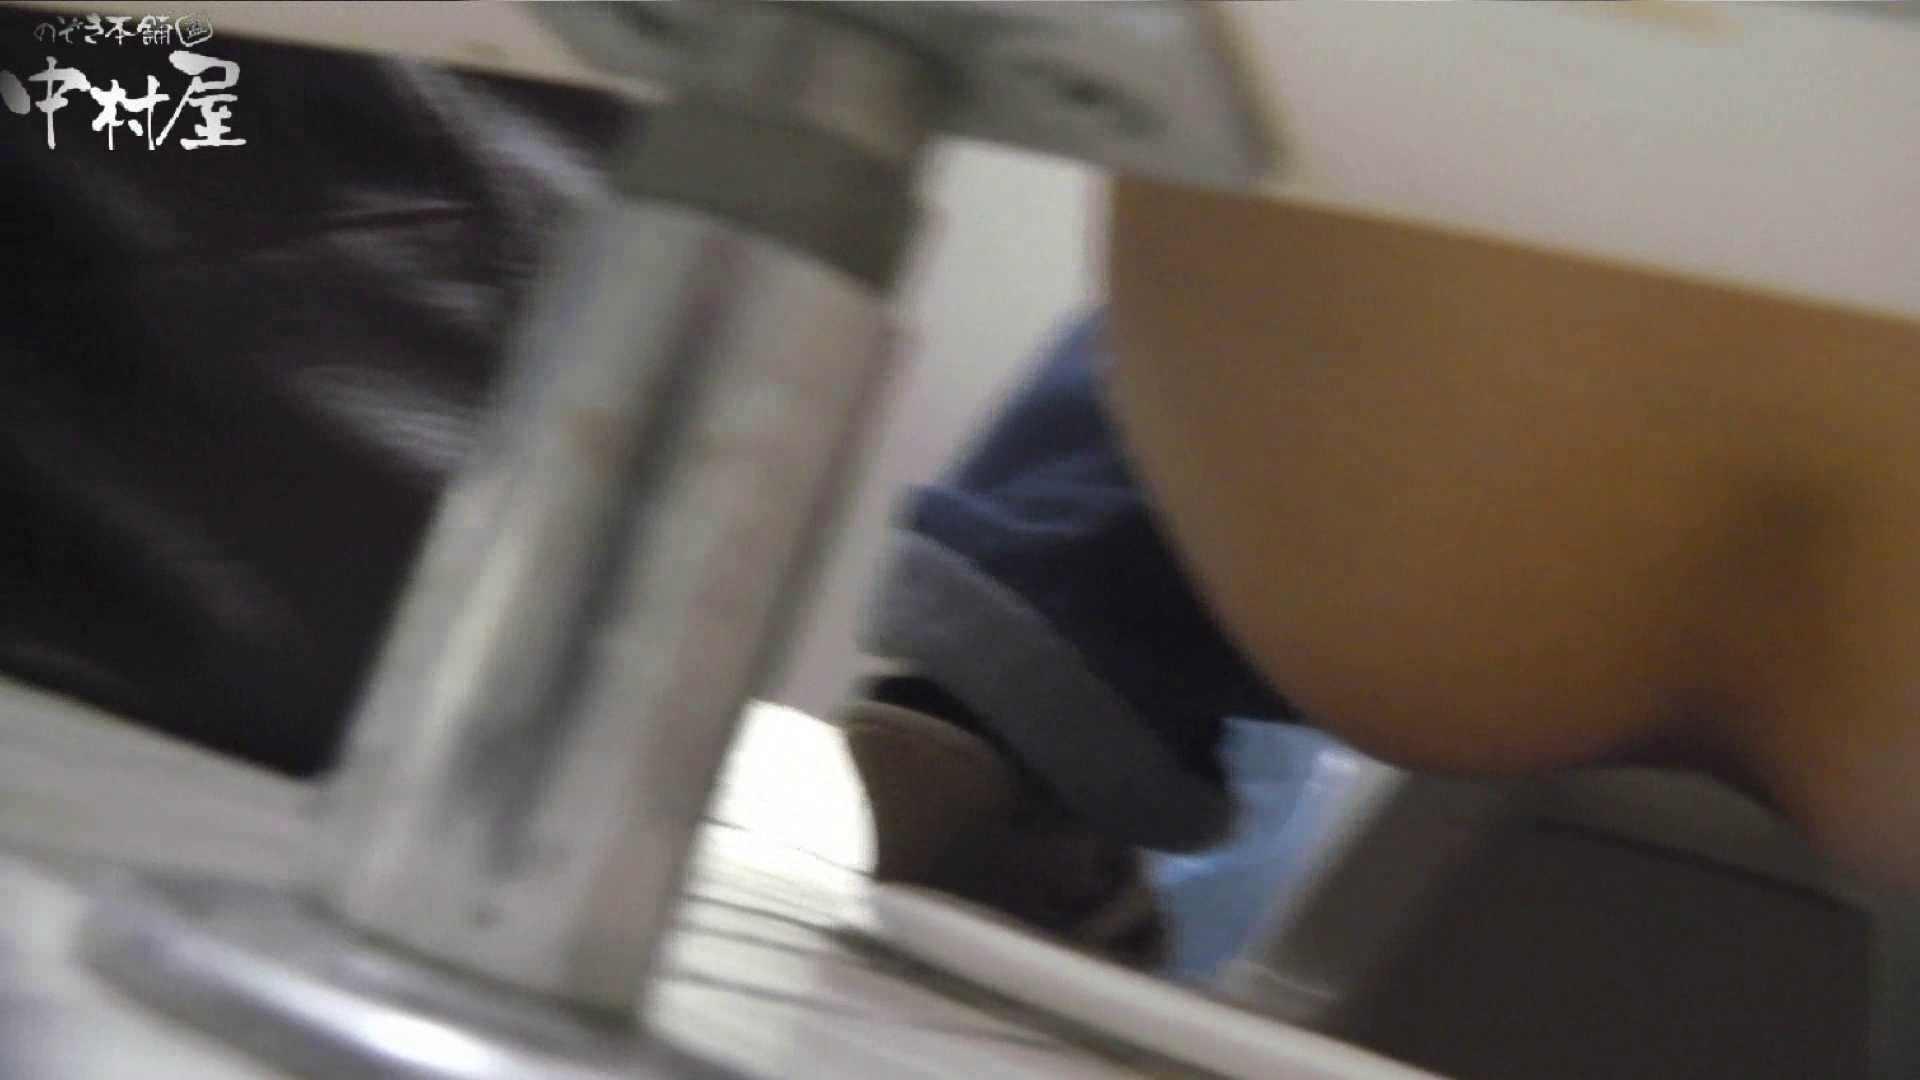 vol.34 命がけ潜伏洗面所! アソコの毛が長髪な件 後編 プライベート エロ画像 88PIX 14